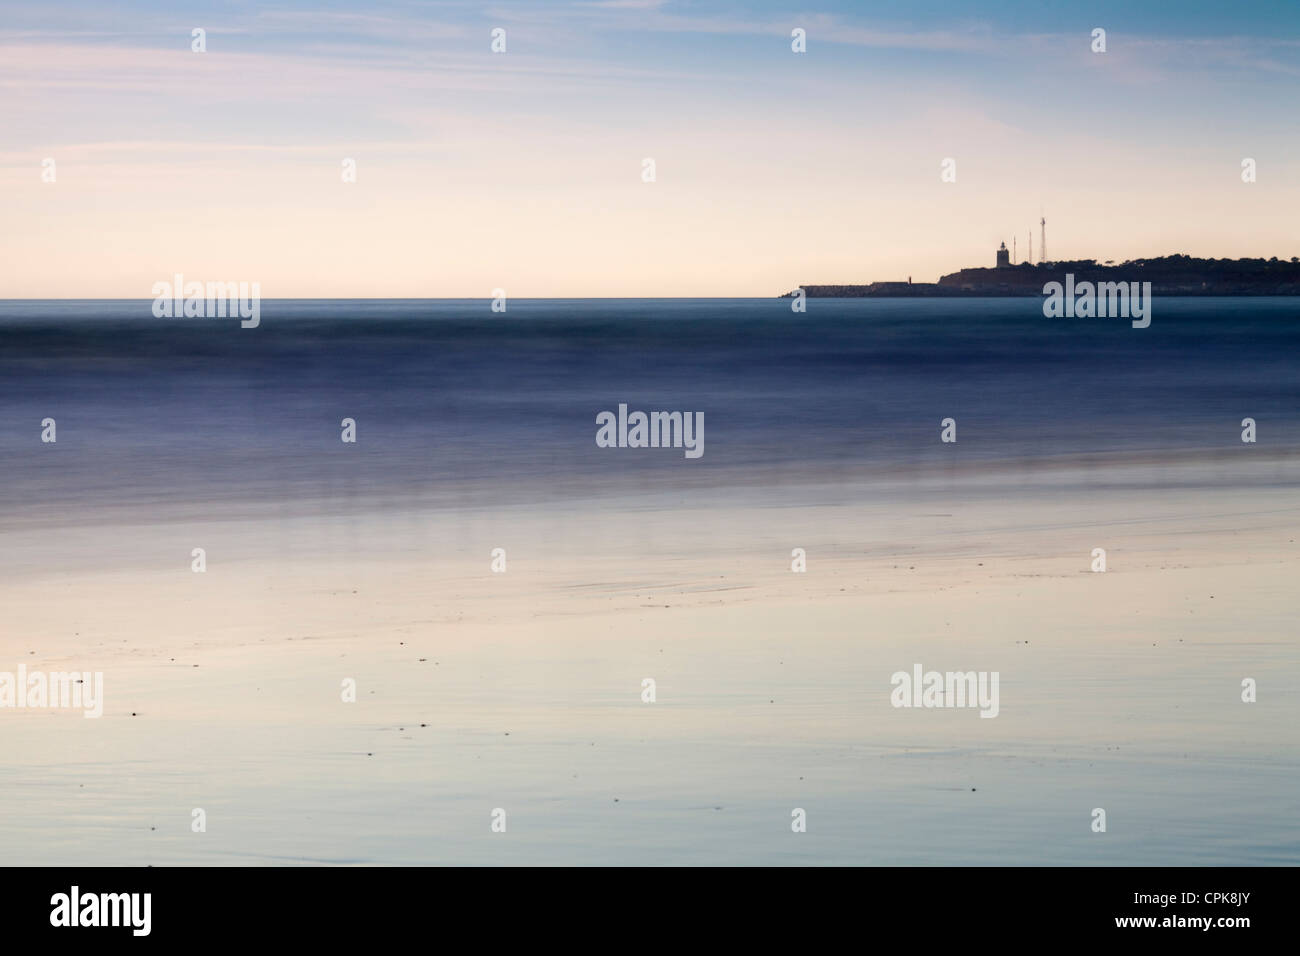 Ätherisch Abend am Strand. Langzeitbelichtung geschossen. Stockbild